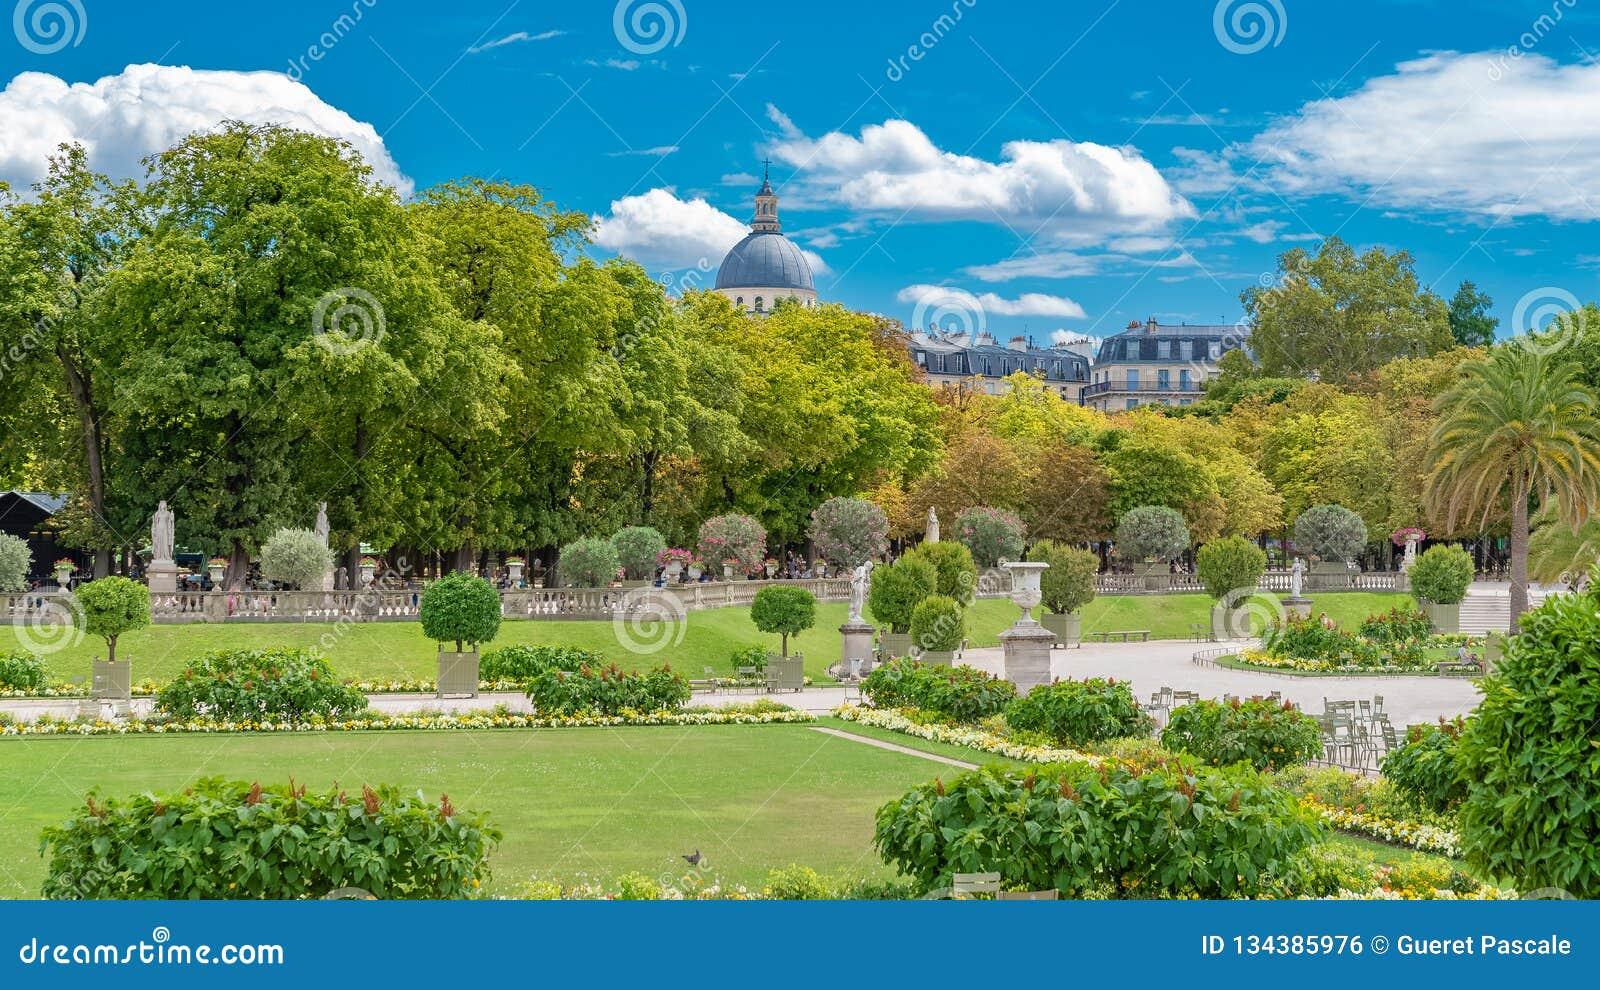 Paris, the Luxembourg garden